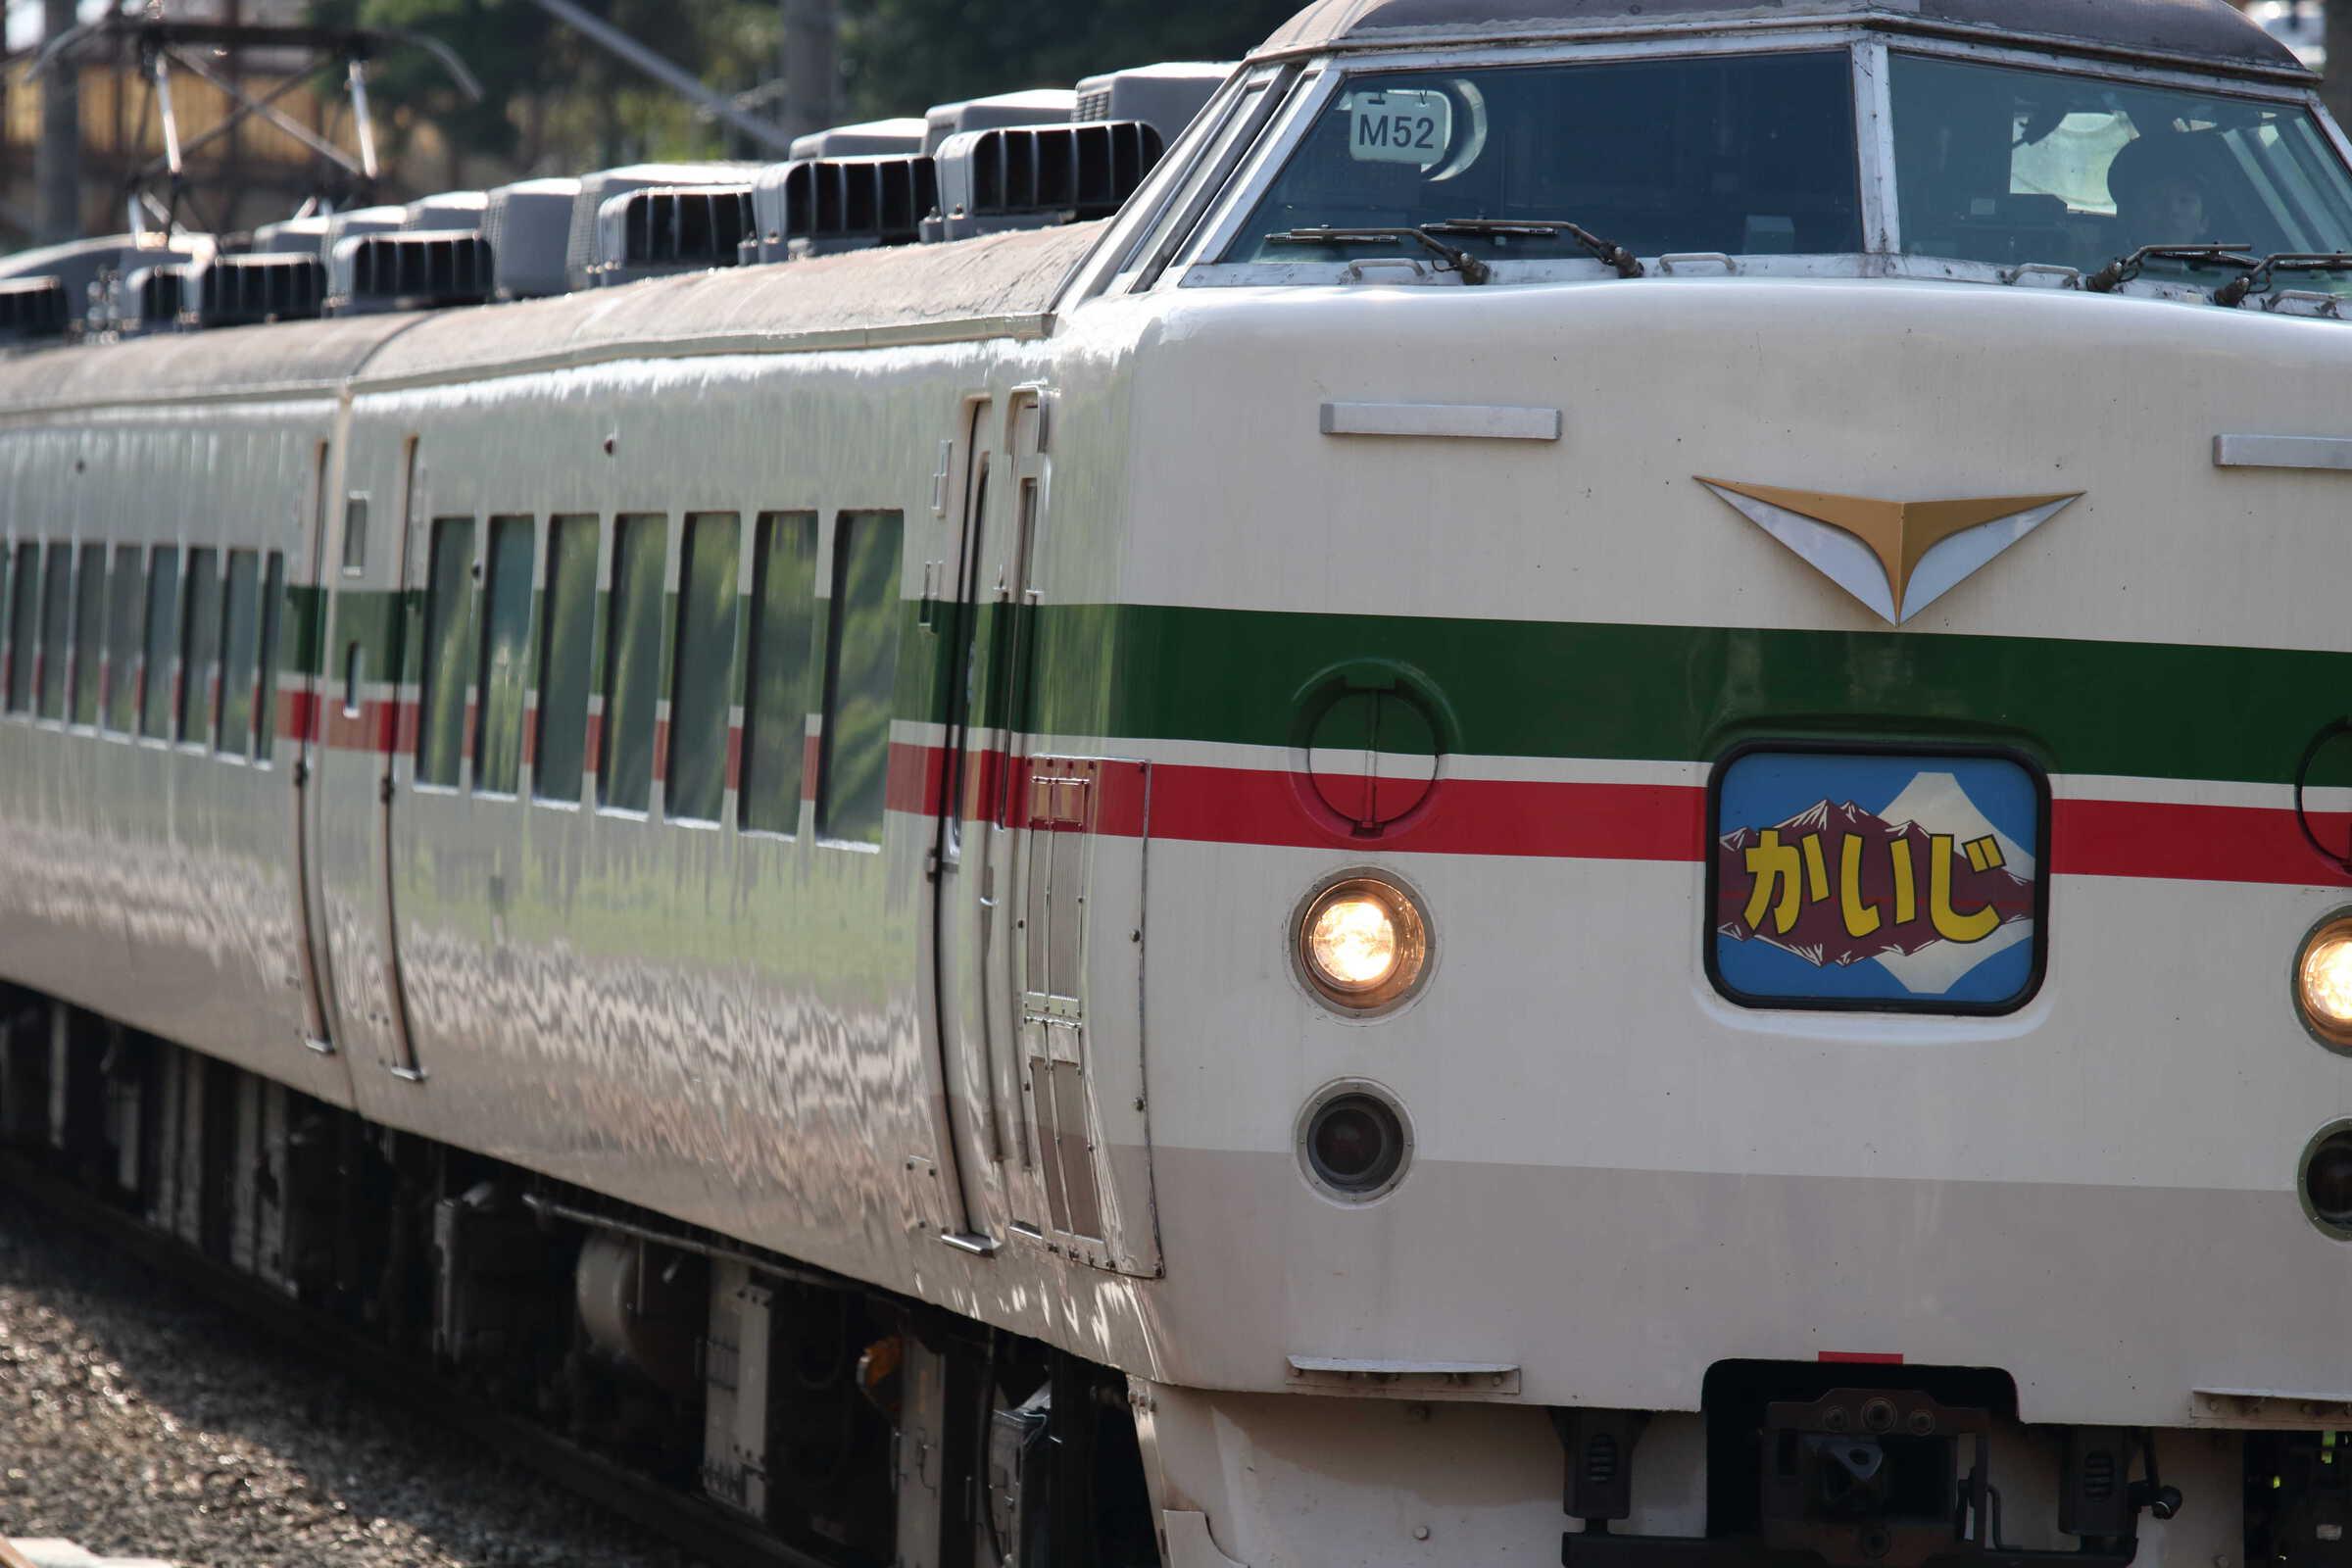 9068M 特急 かいじ188号 189系 八トタM52編成